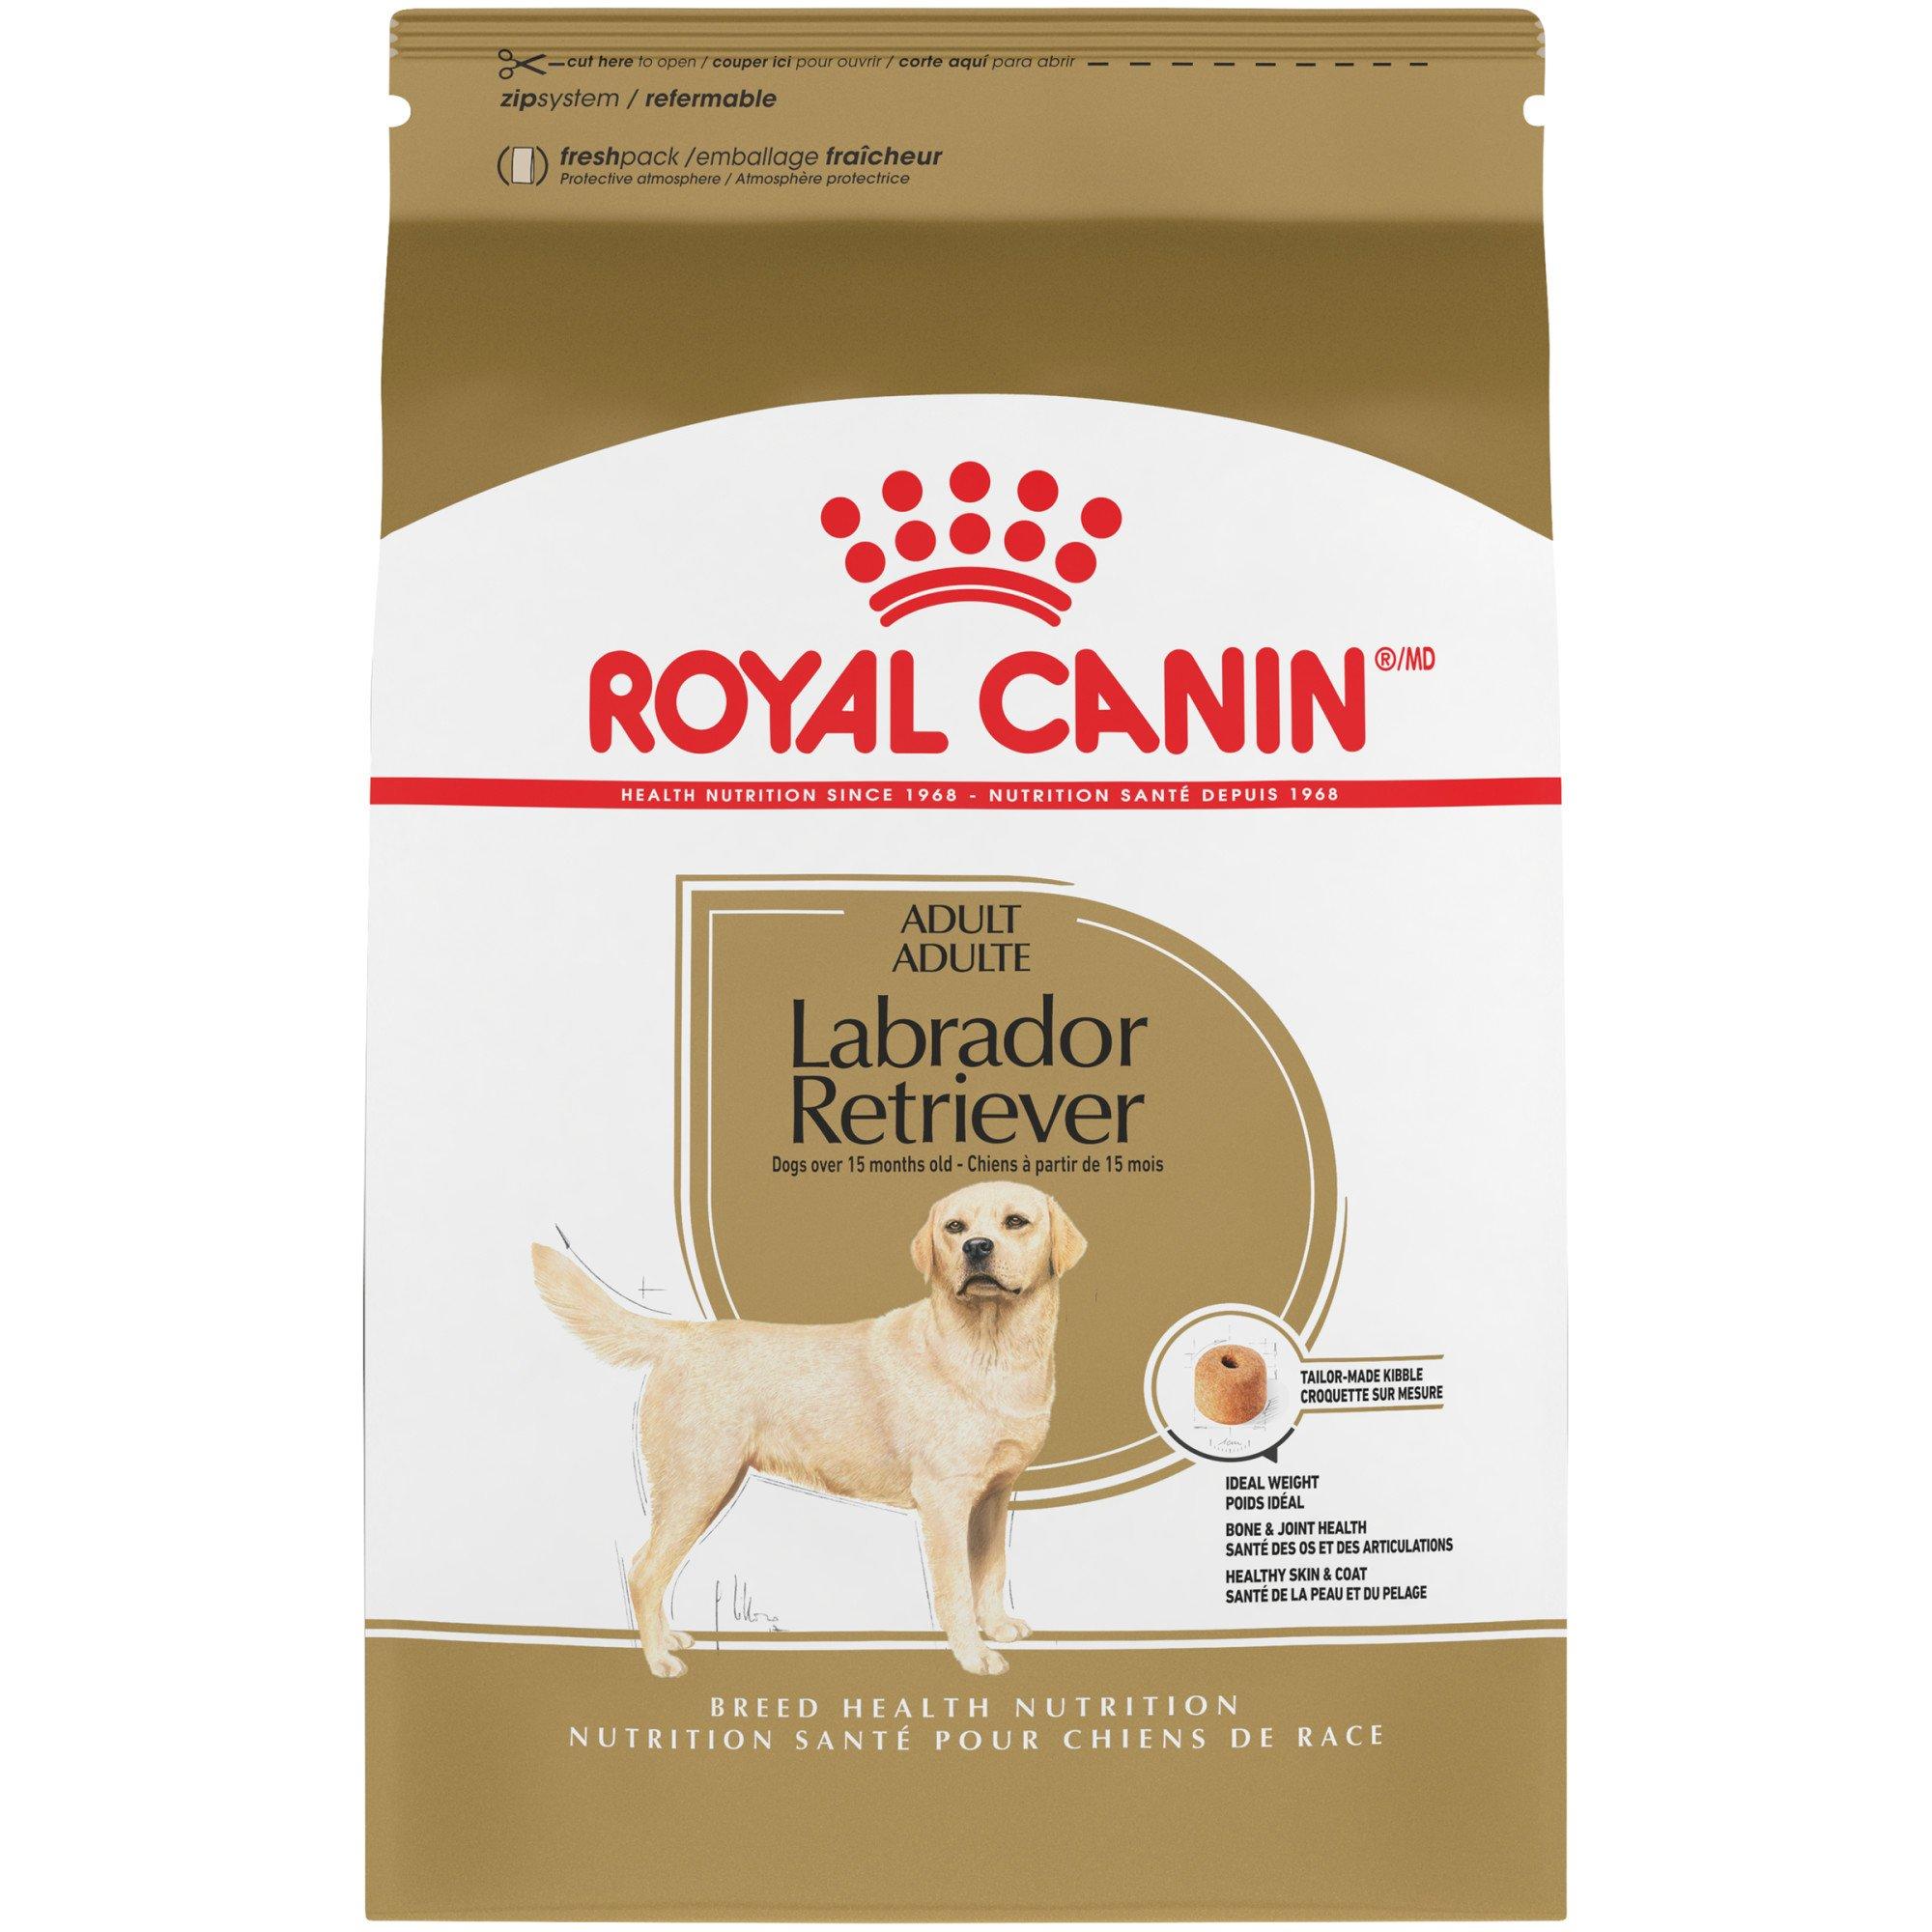 Royal Canin Breed Health Nutrition Labrador Retriever Adult Dry Dog Food